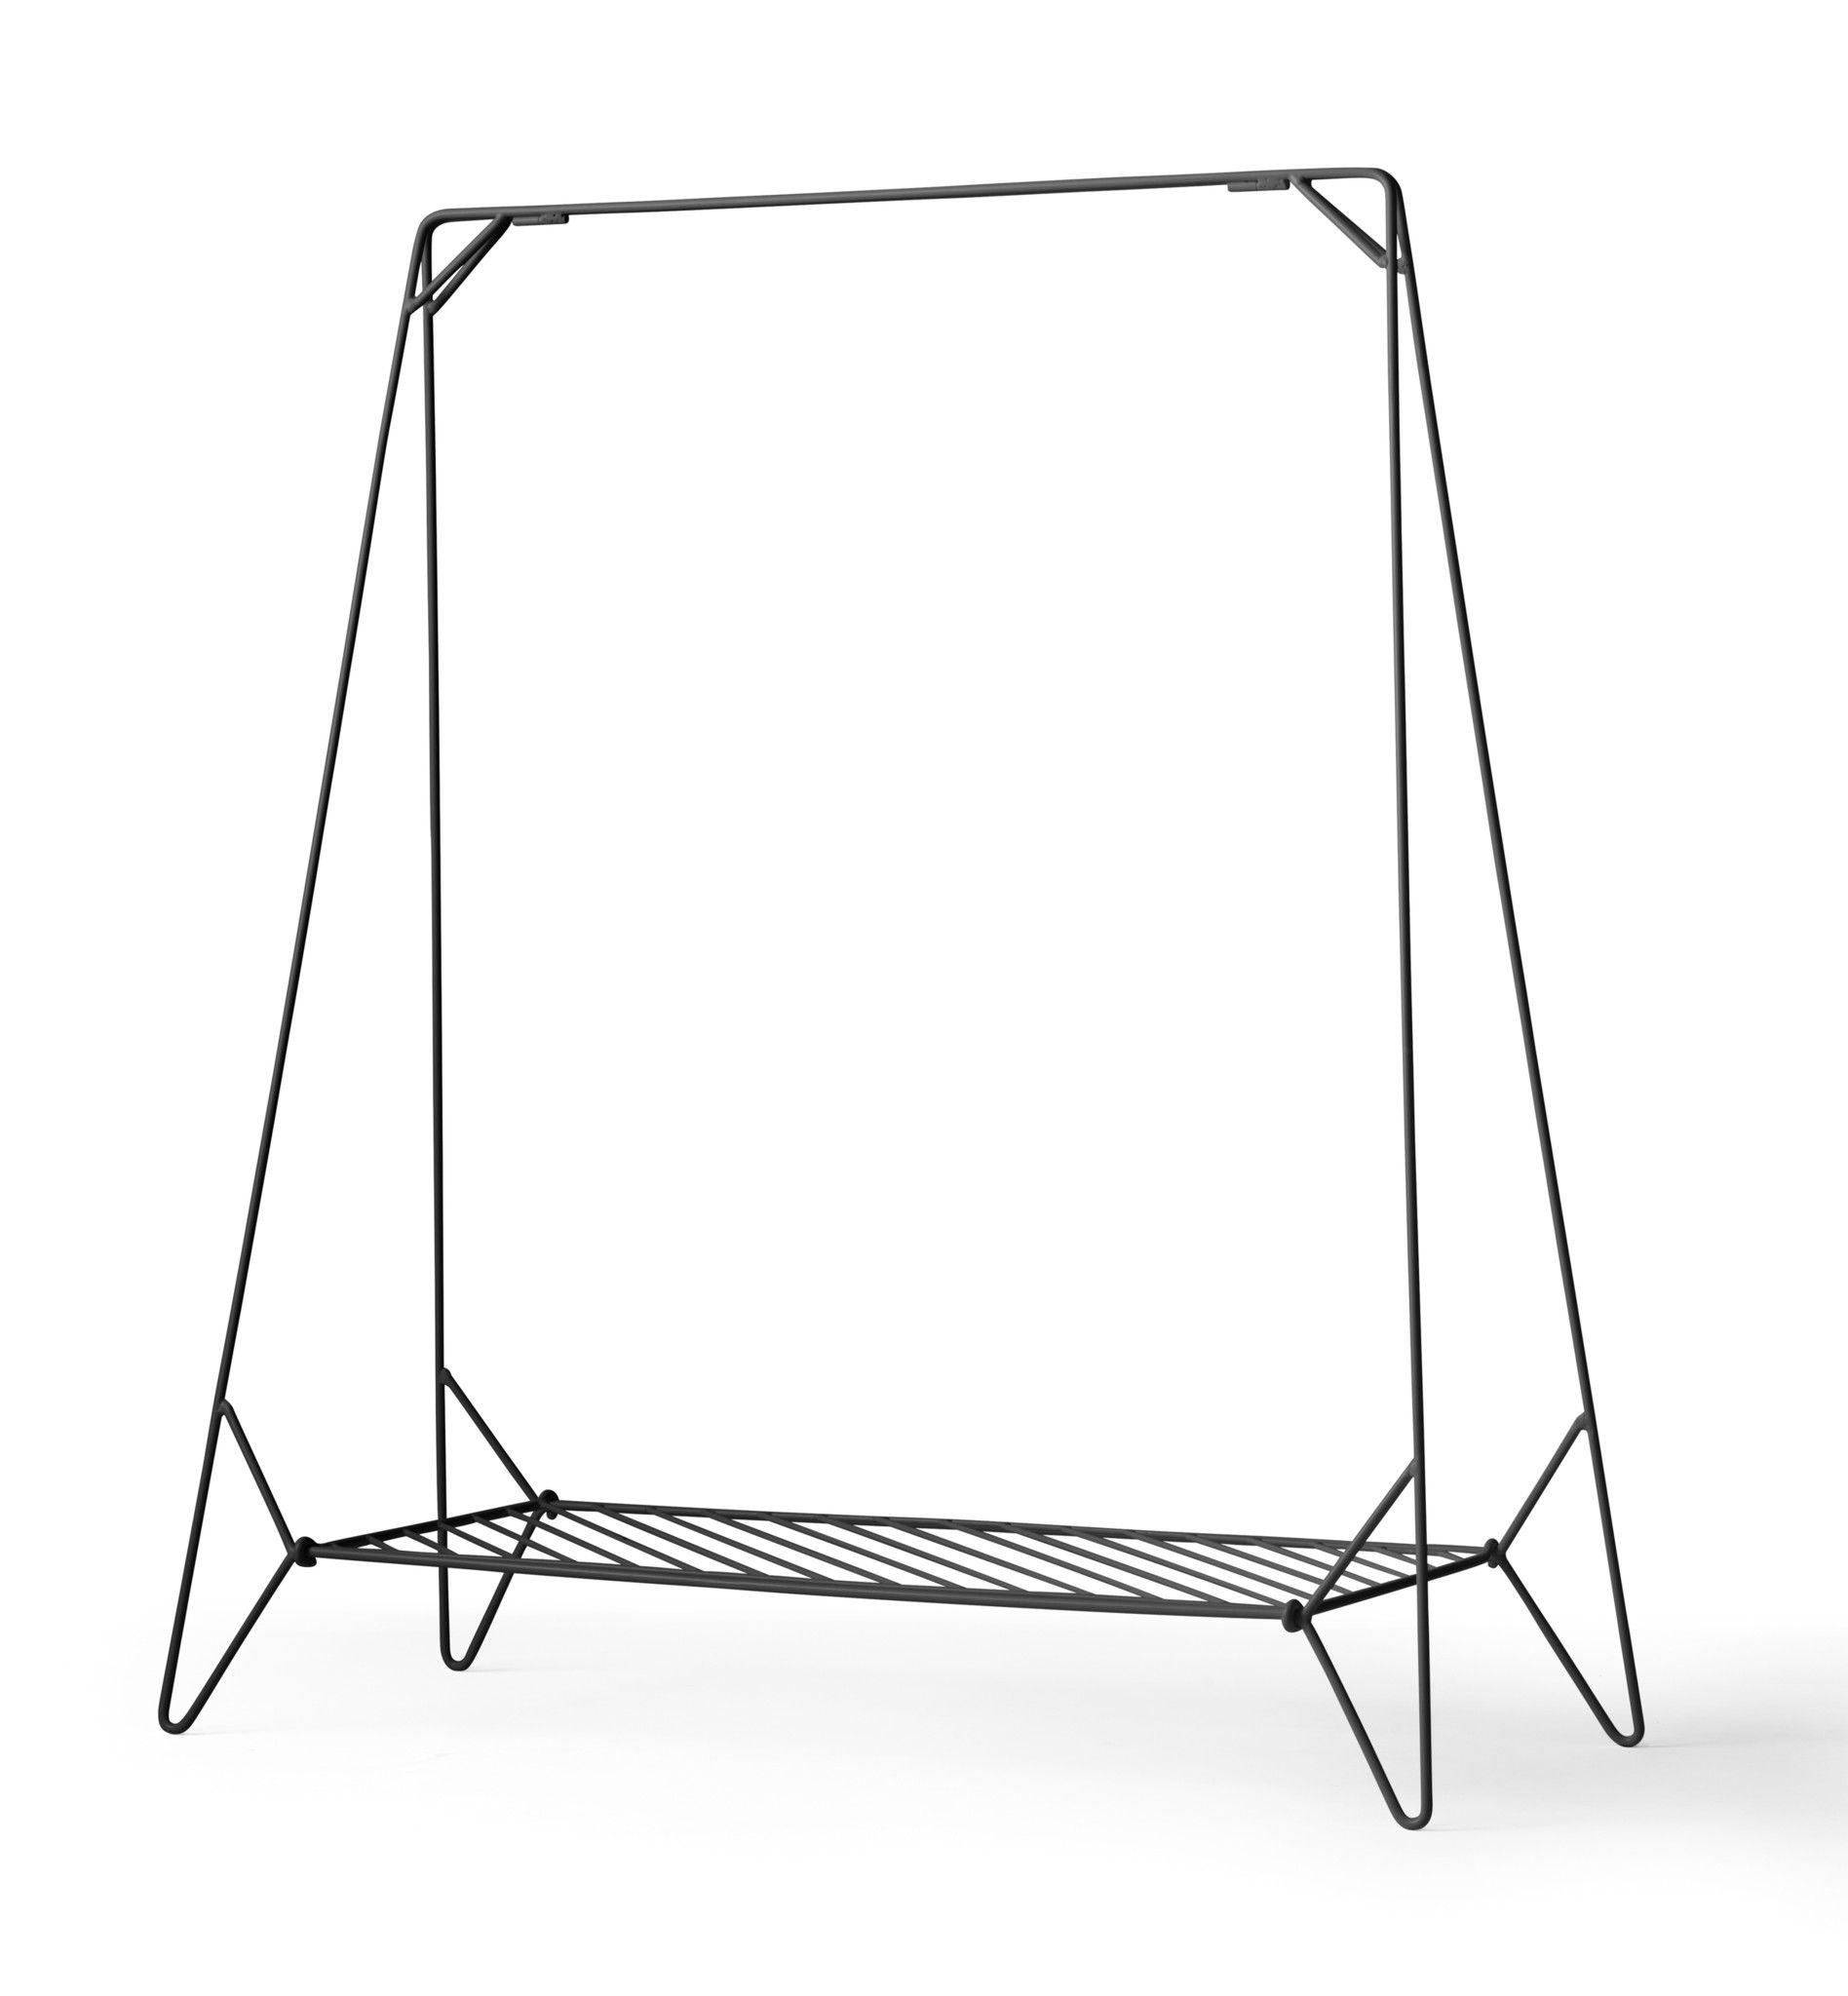 Clothing rack anker studio for menu future houzz pinterest